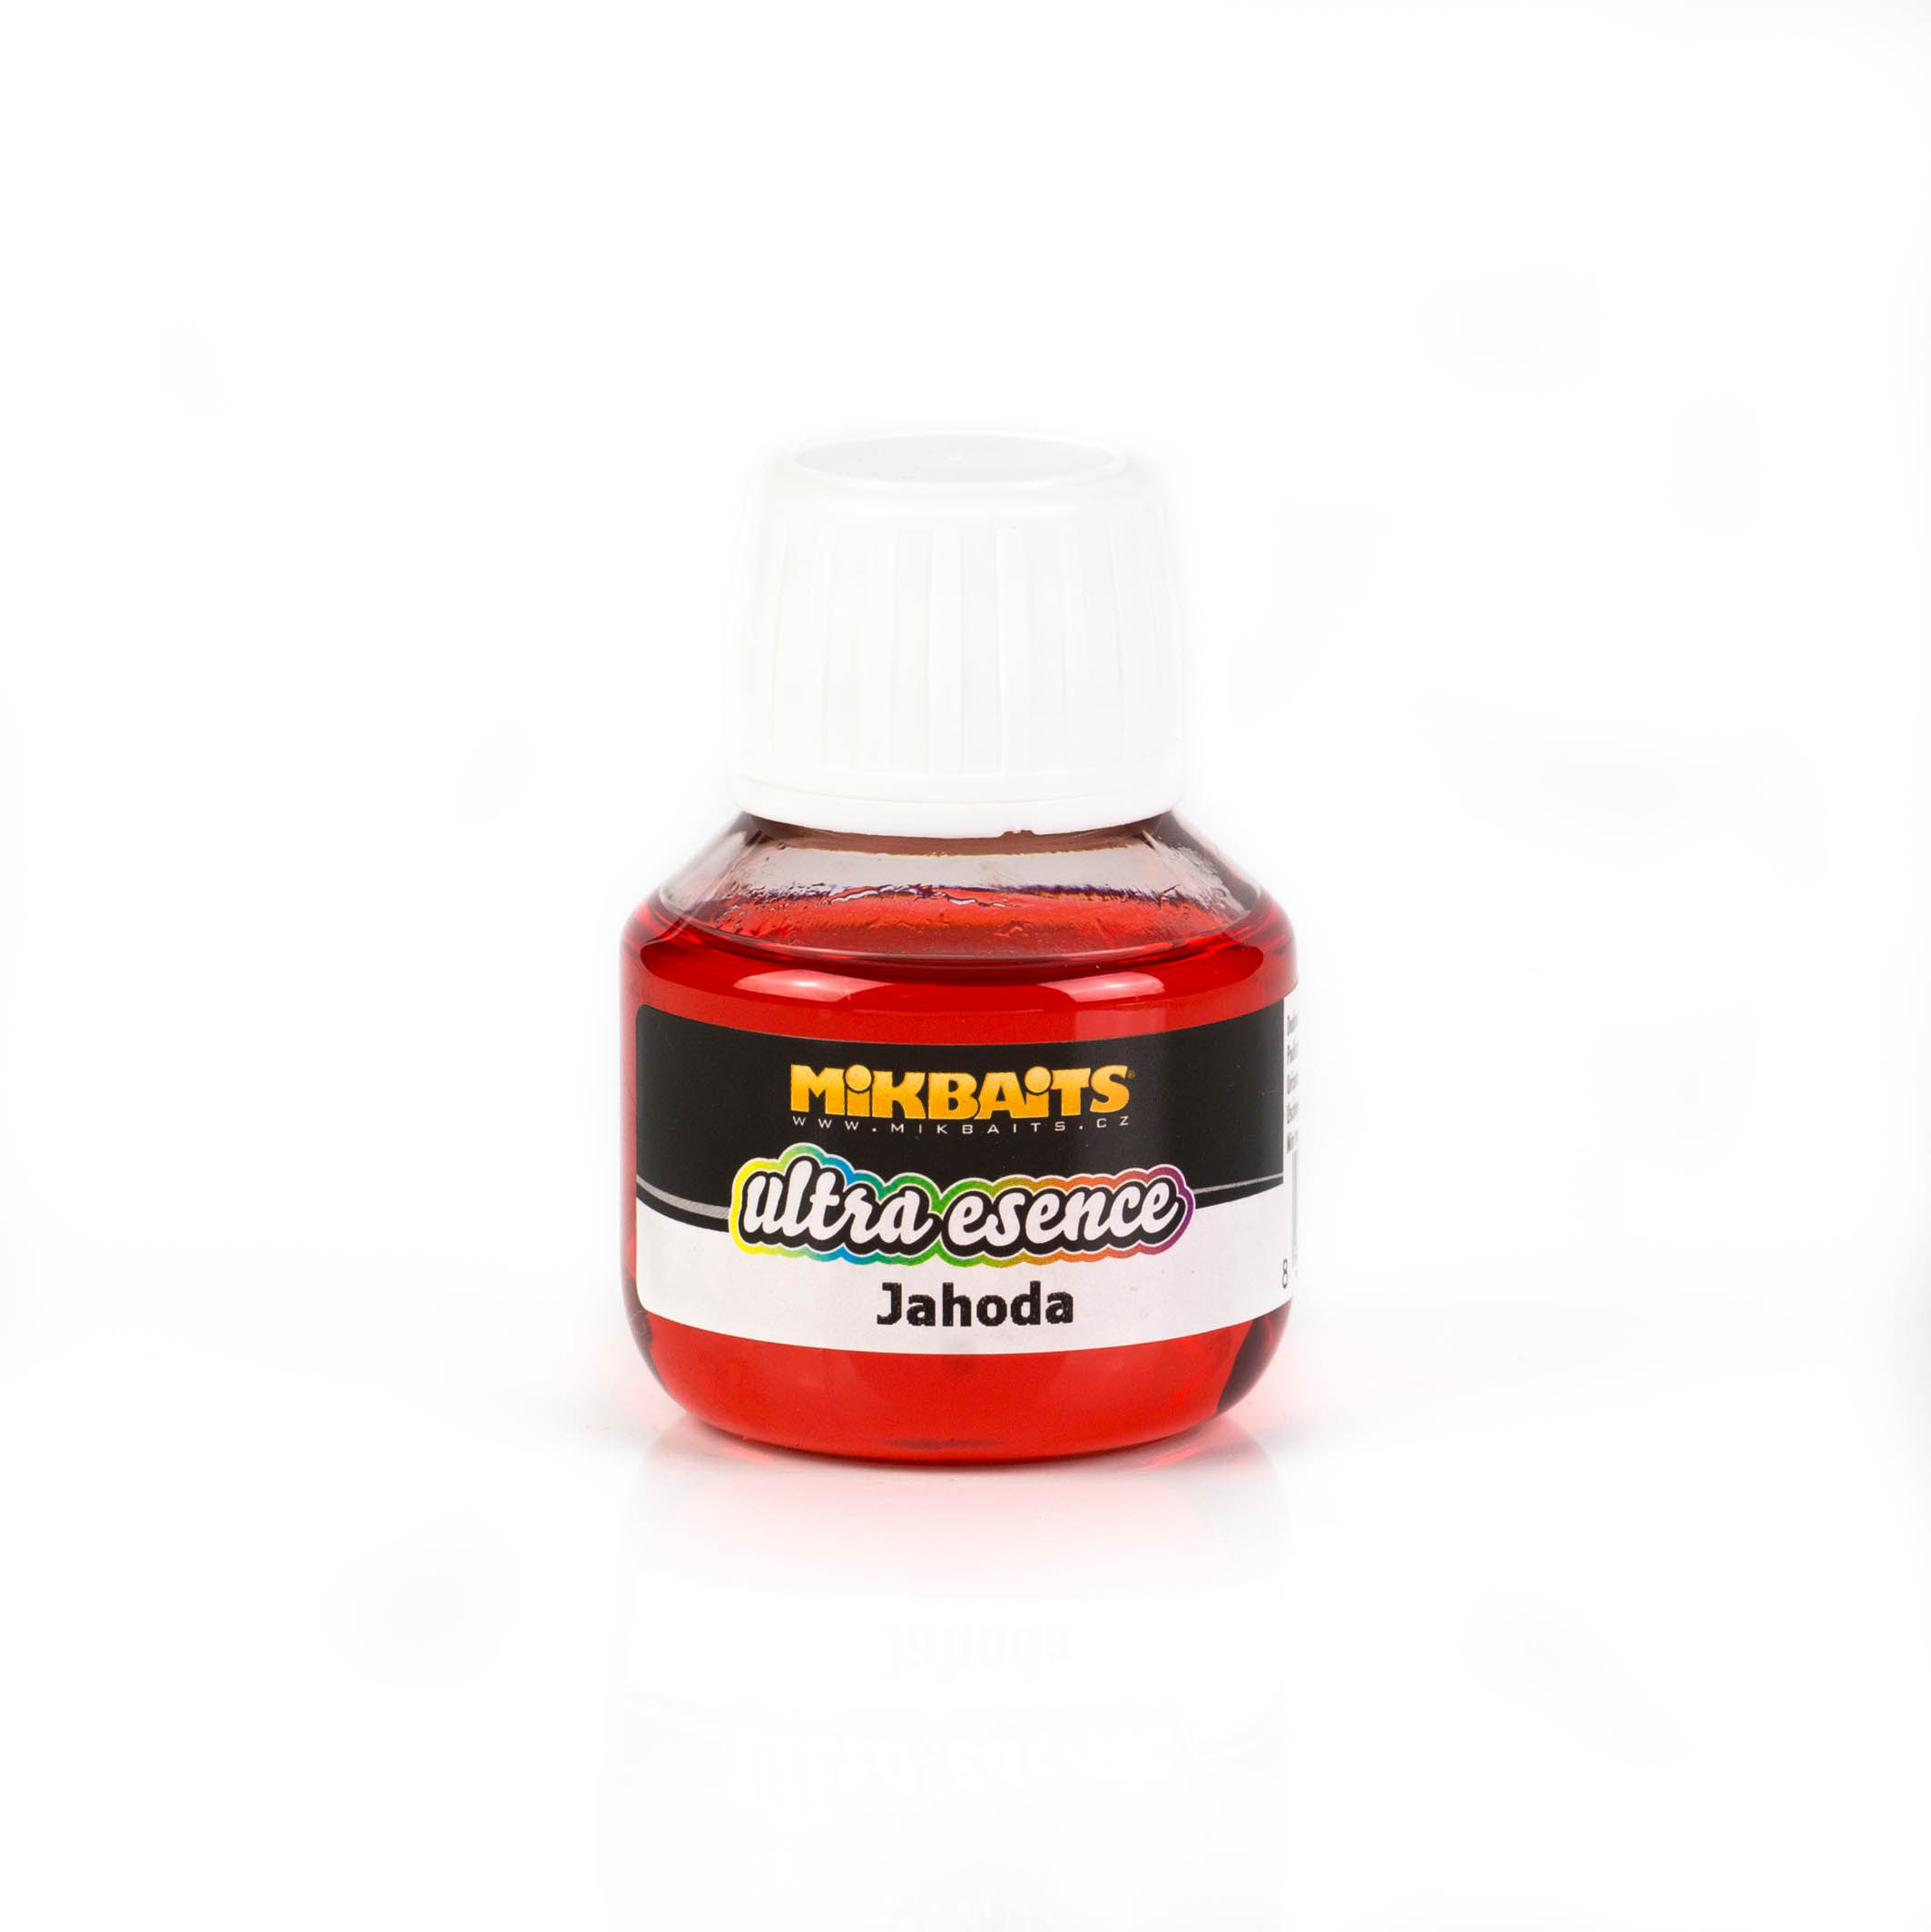 Ultra esence 50ml - Jahoda